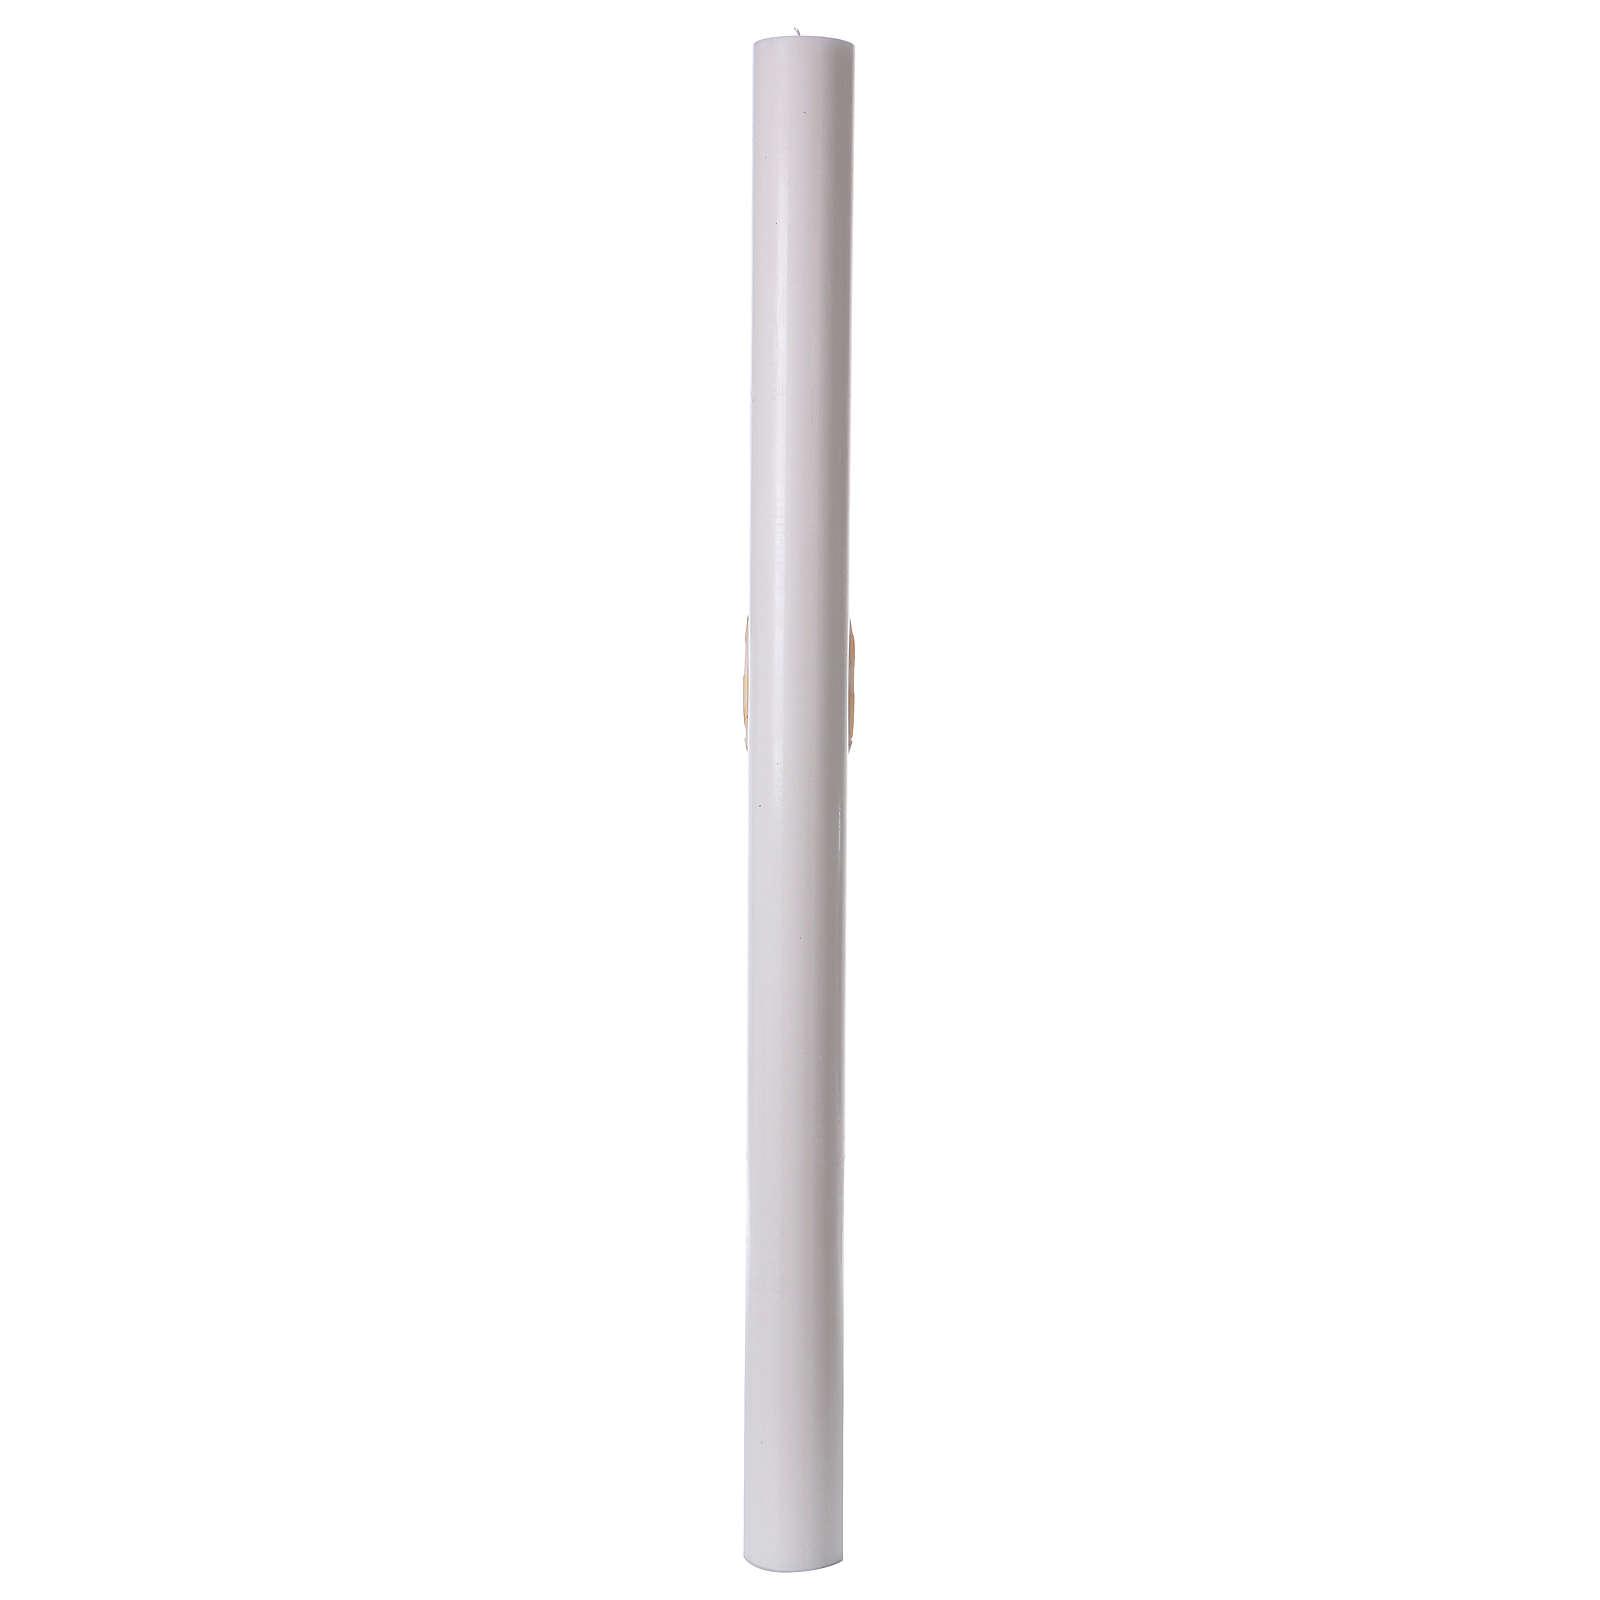 Cero pasquale bianco Barca 8x120 cm 3